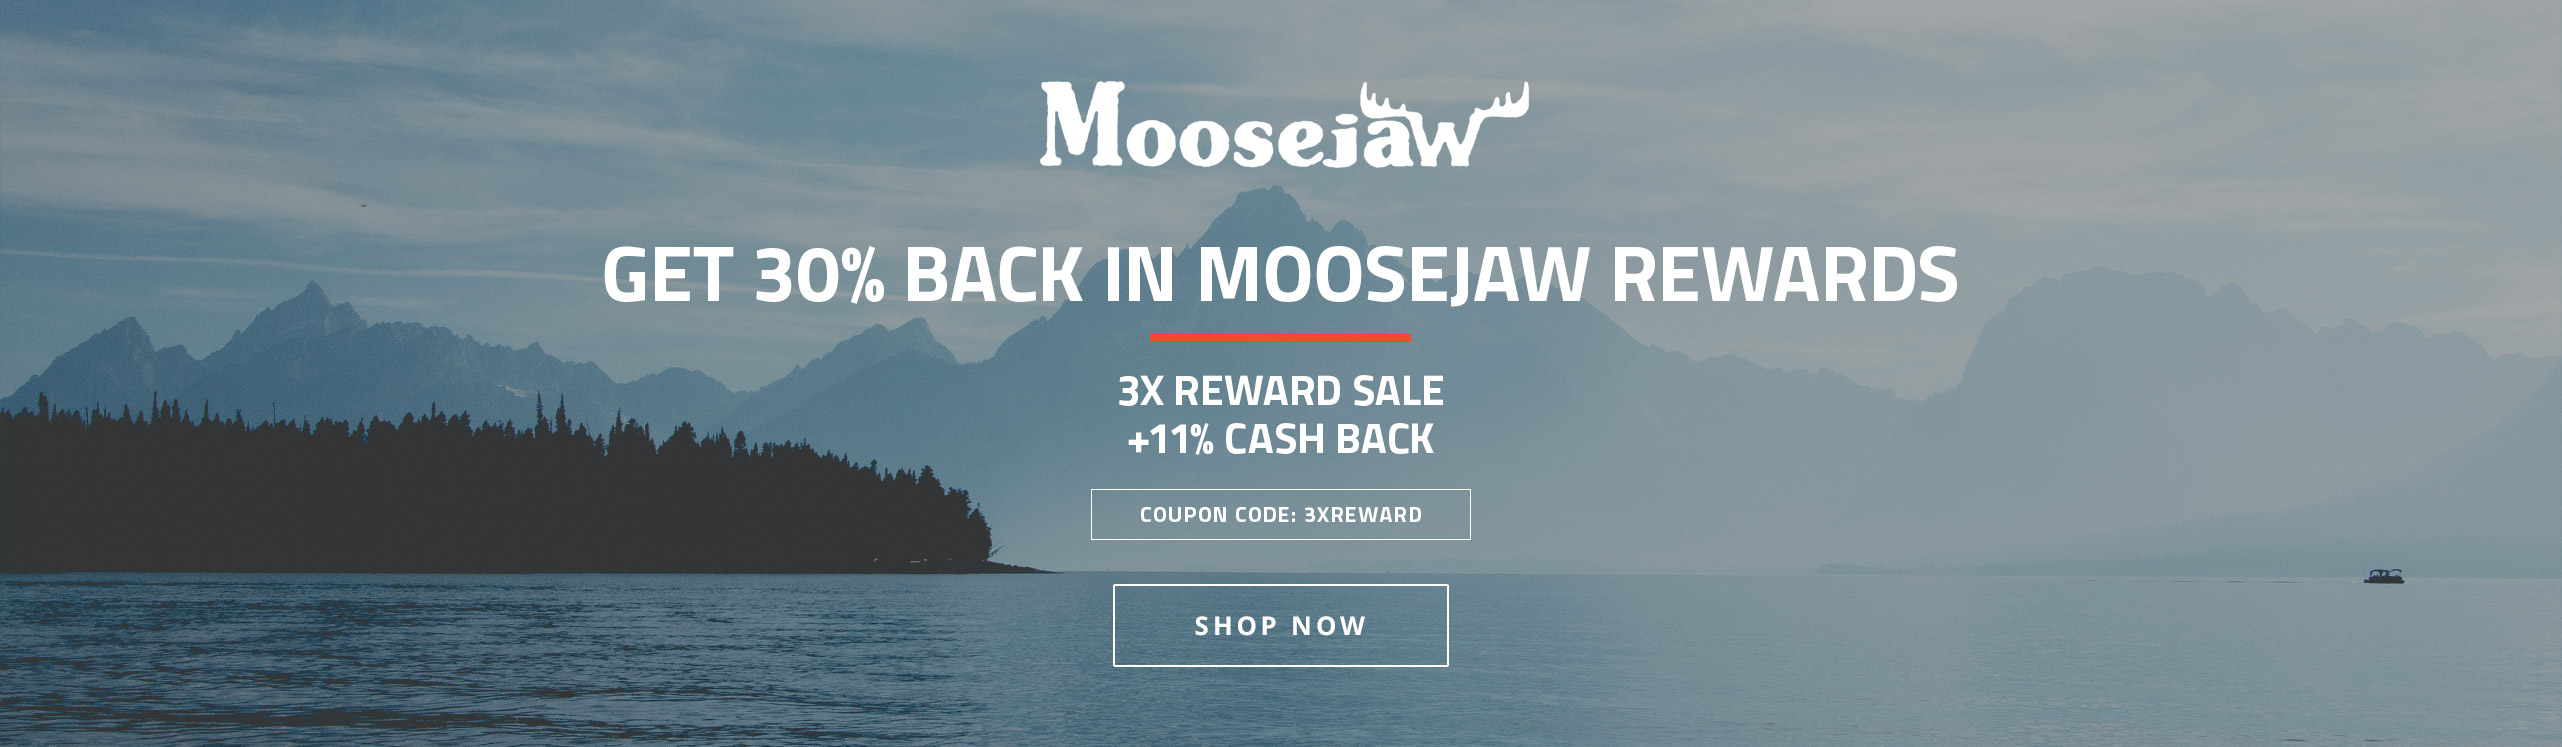 Moosejaw (11%) 3X Rewards Sale